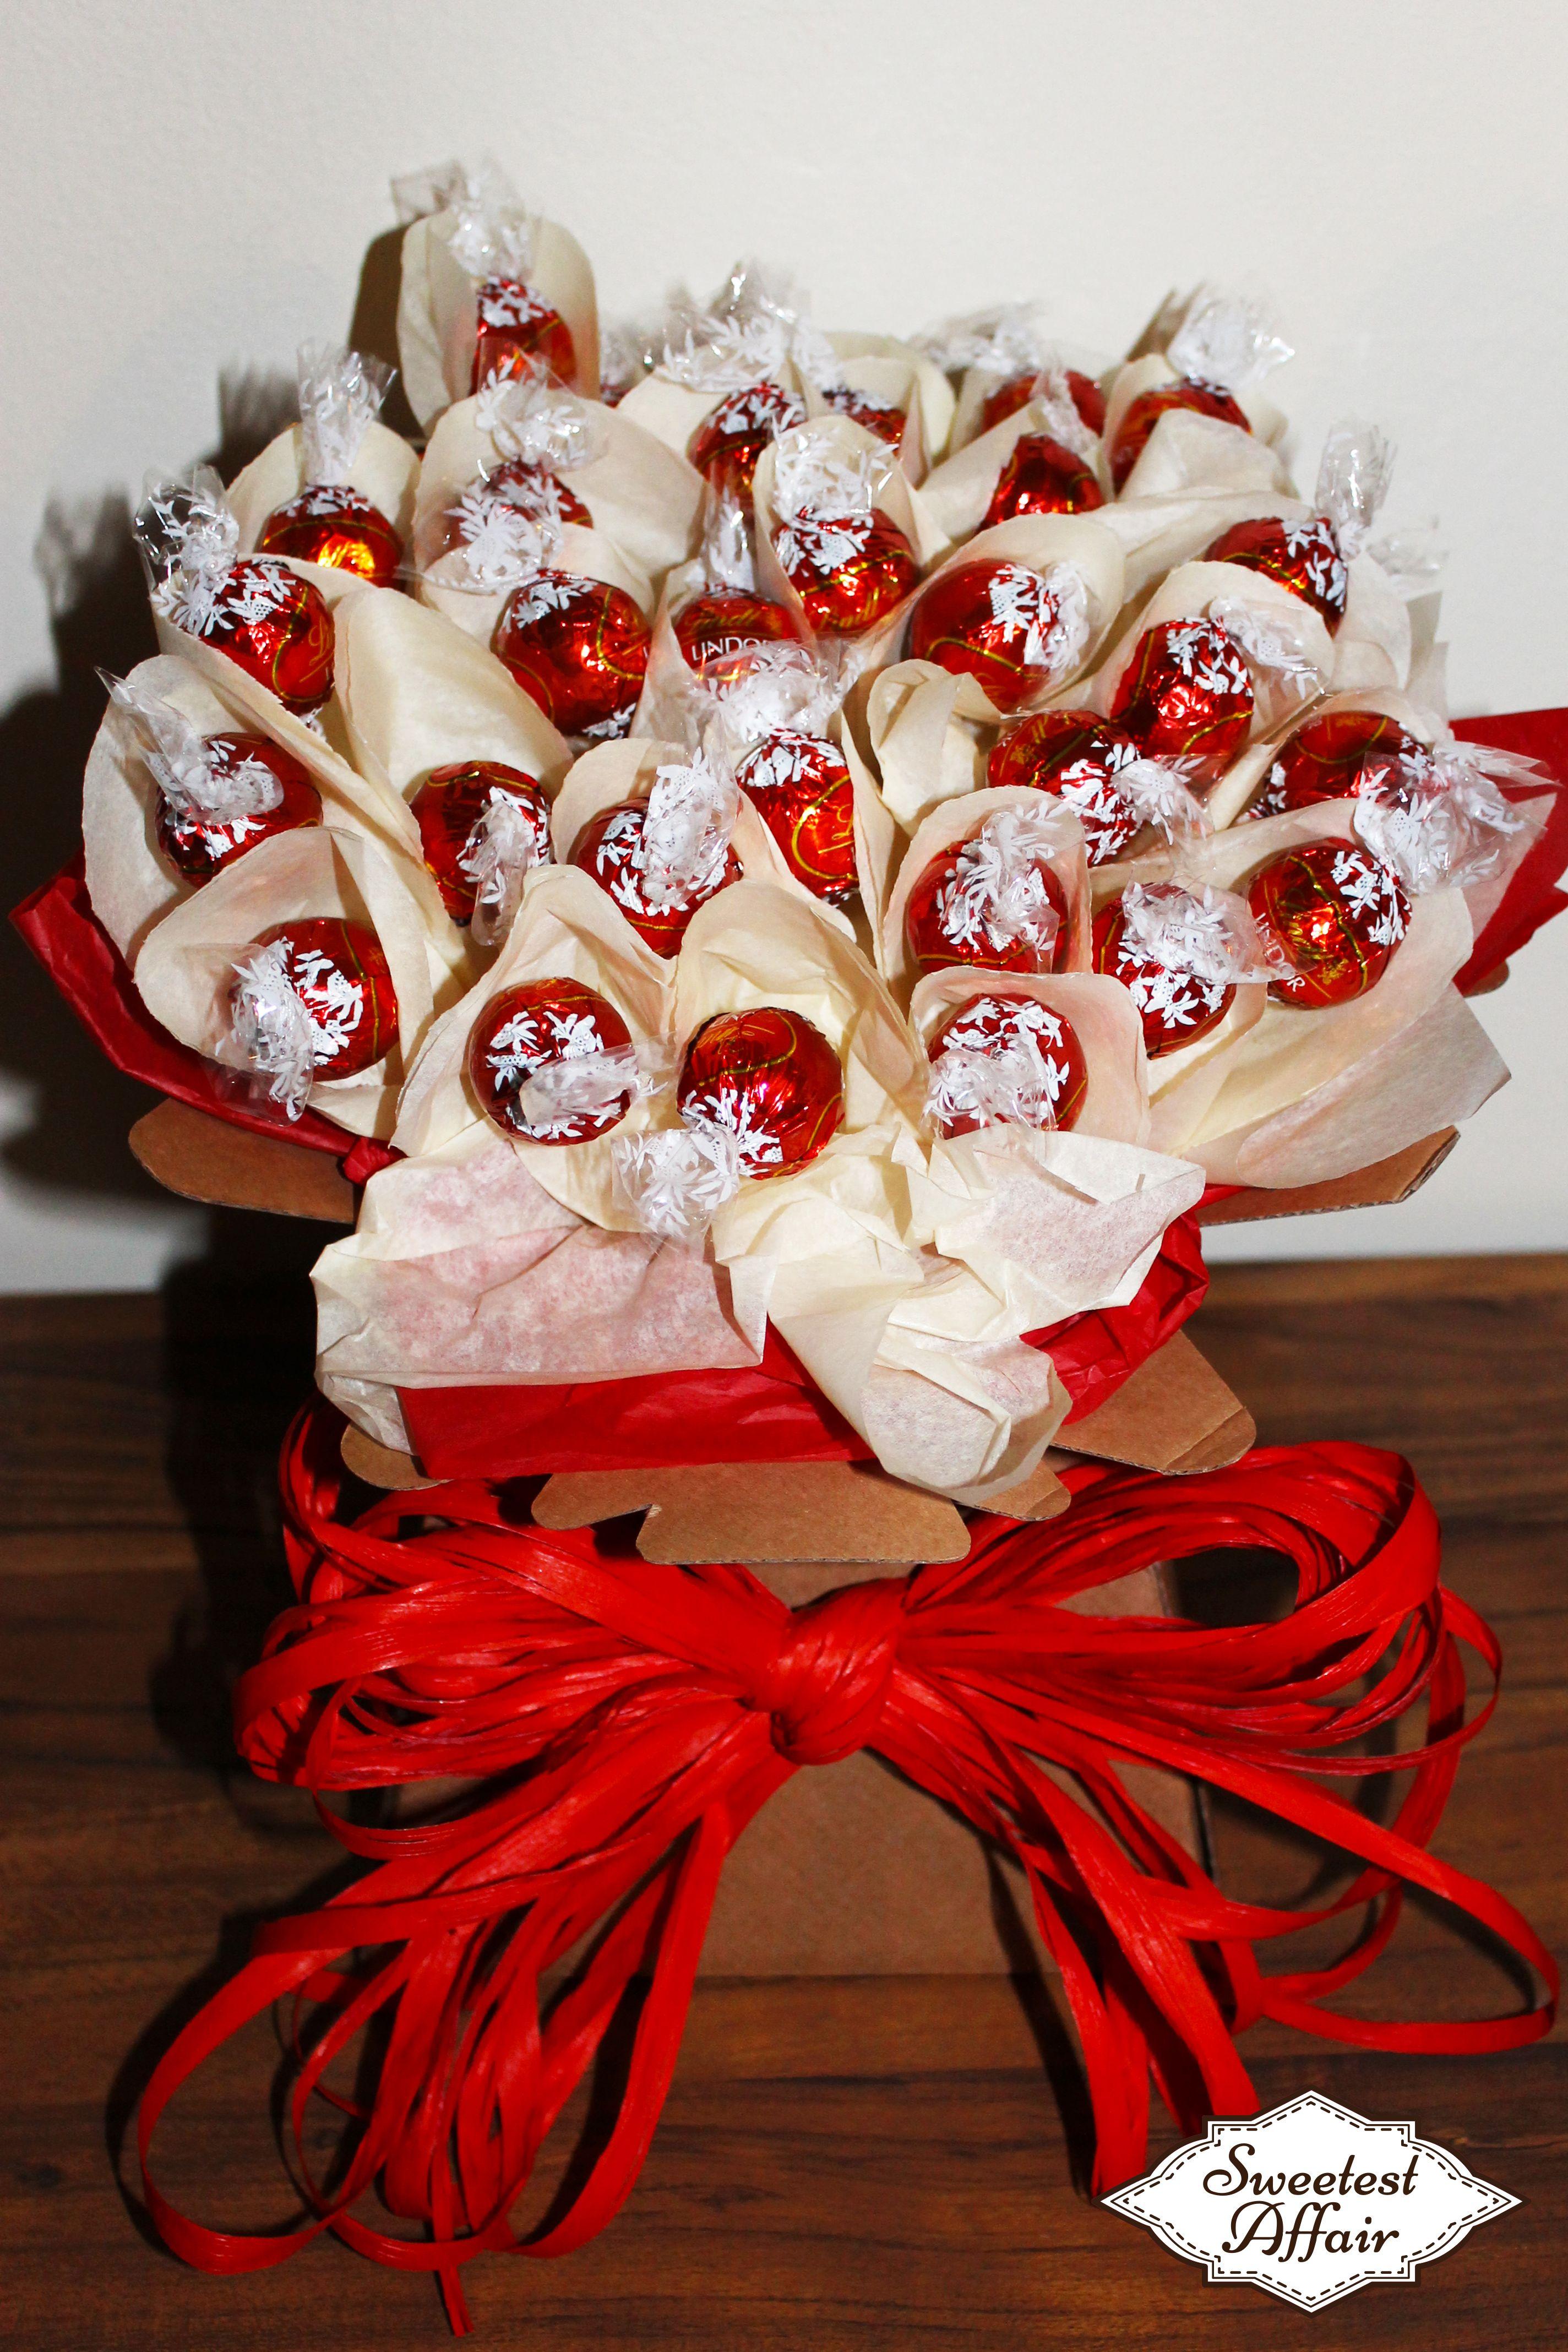 Chocolate bouquet on pinterest candy flowers bouquet of chocolate - Lindt Red Lindor Chocolate Truffle Sweet Bouquet Http Www Ebay Co